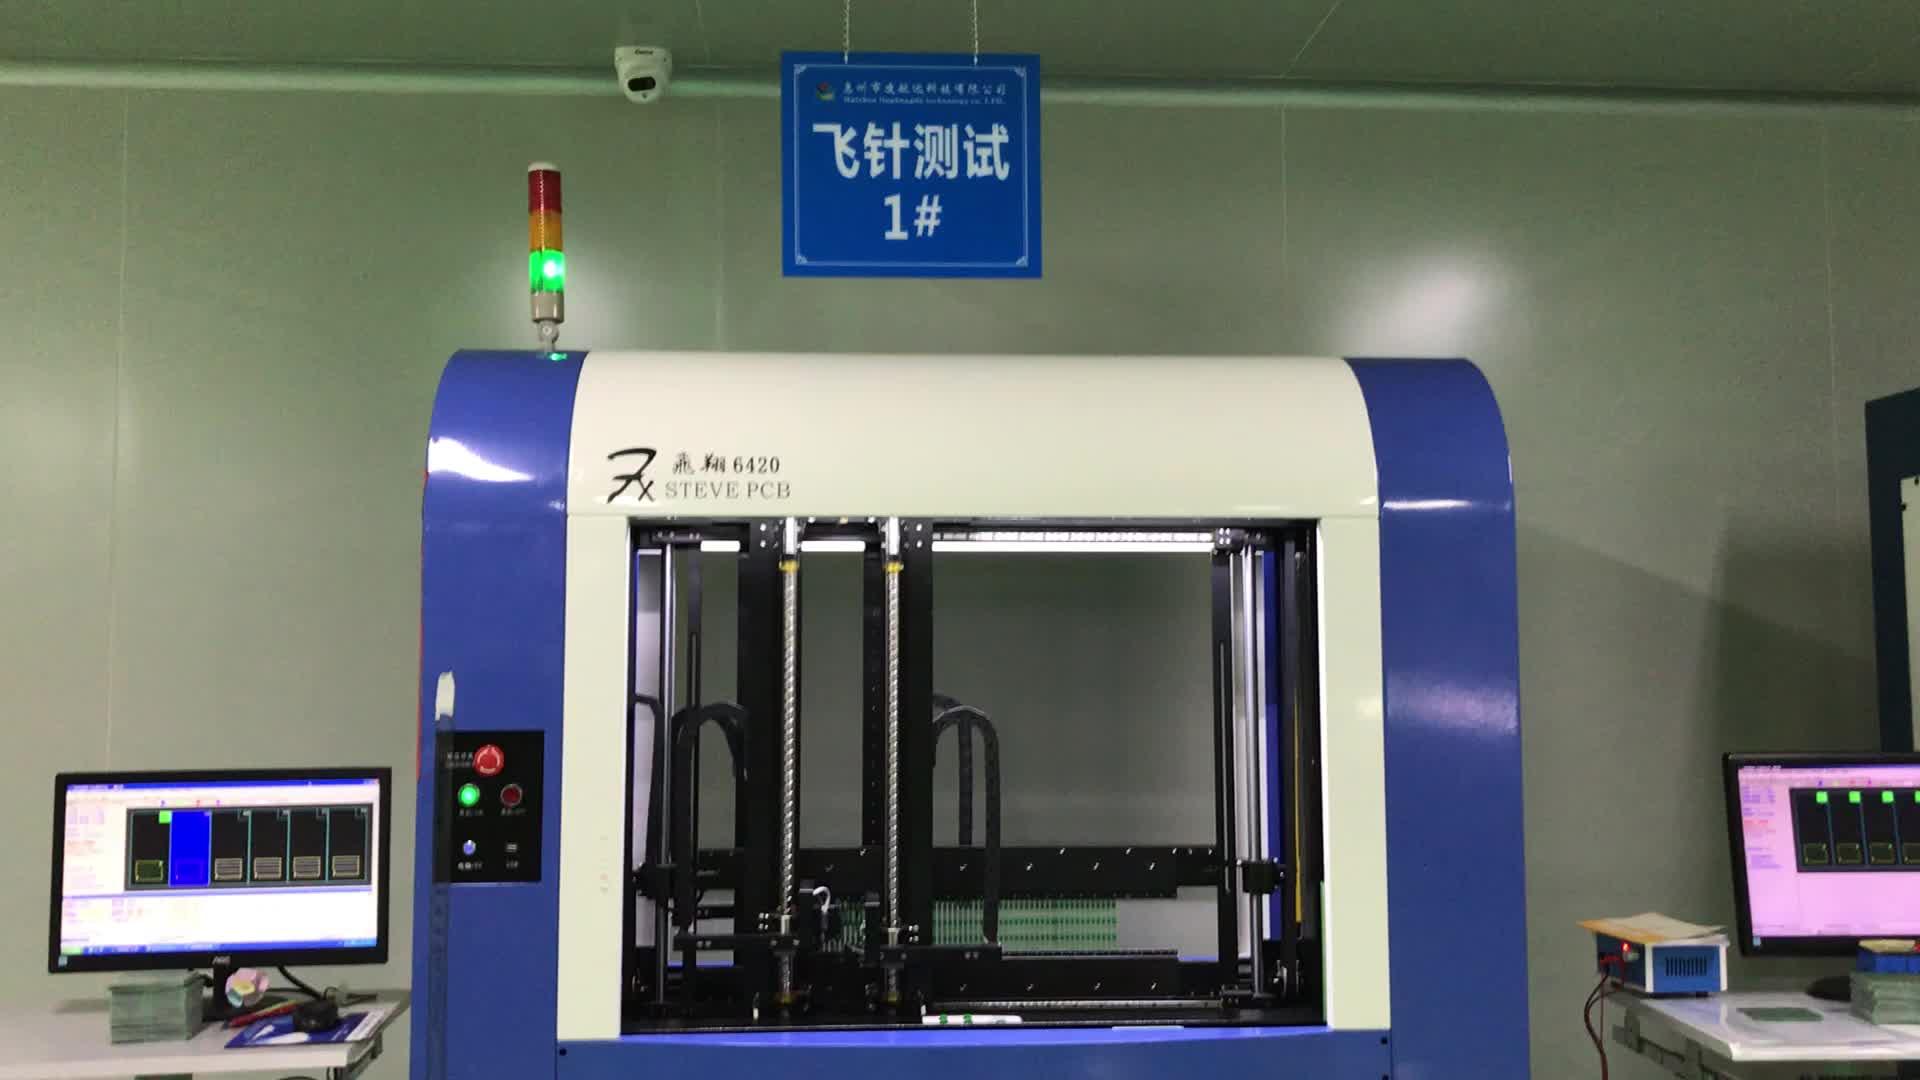 Hot Koop Shenzhen ROHS CE PCB Prototype Verwerking PCBA Reverse Engineering